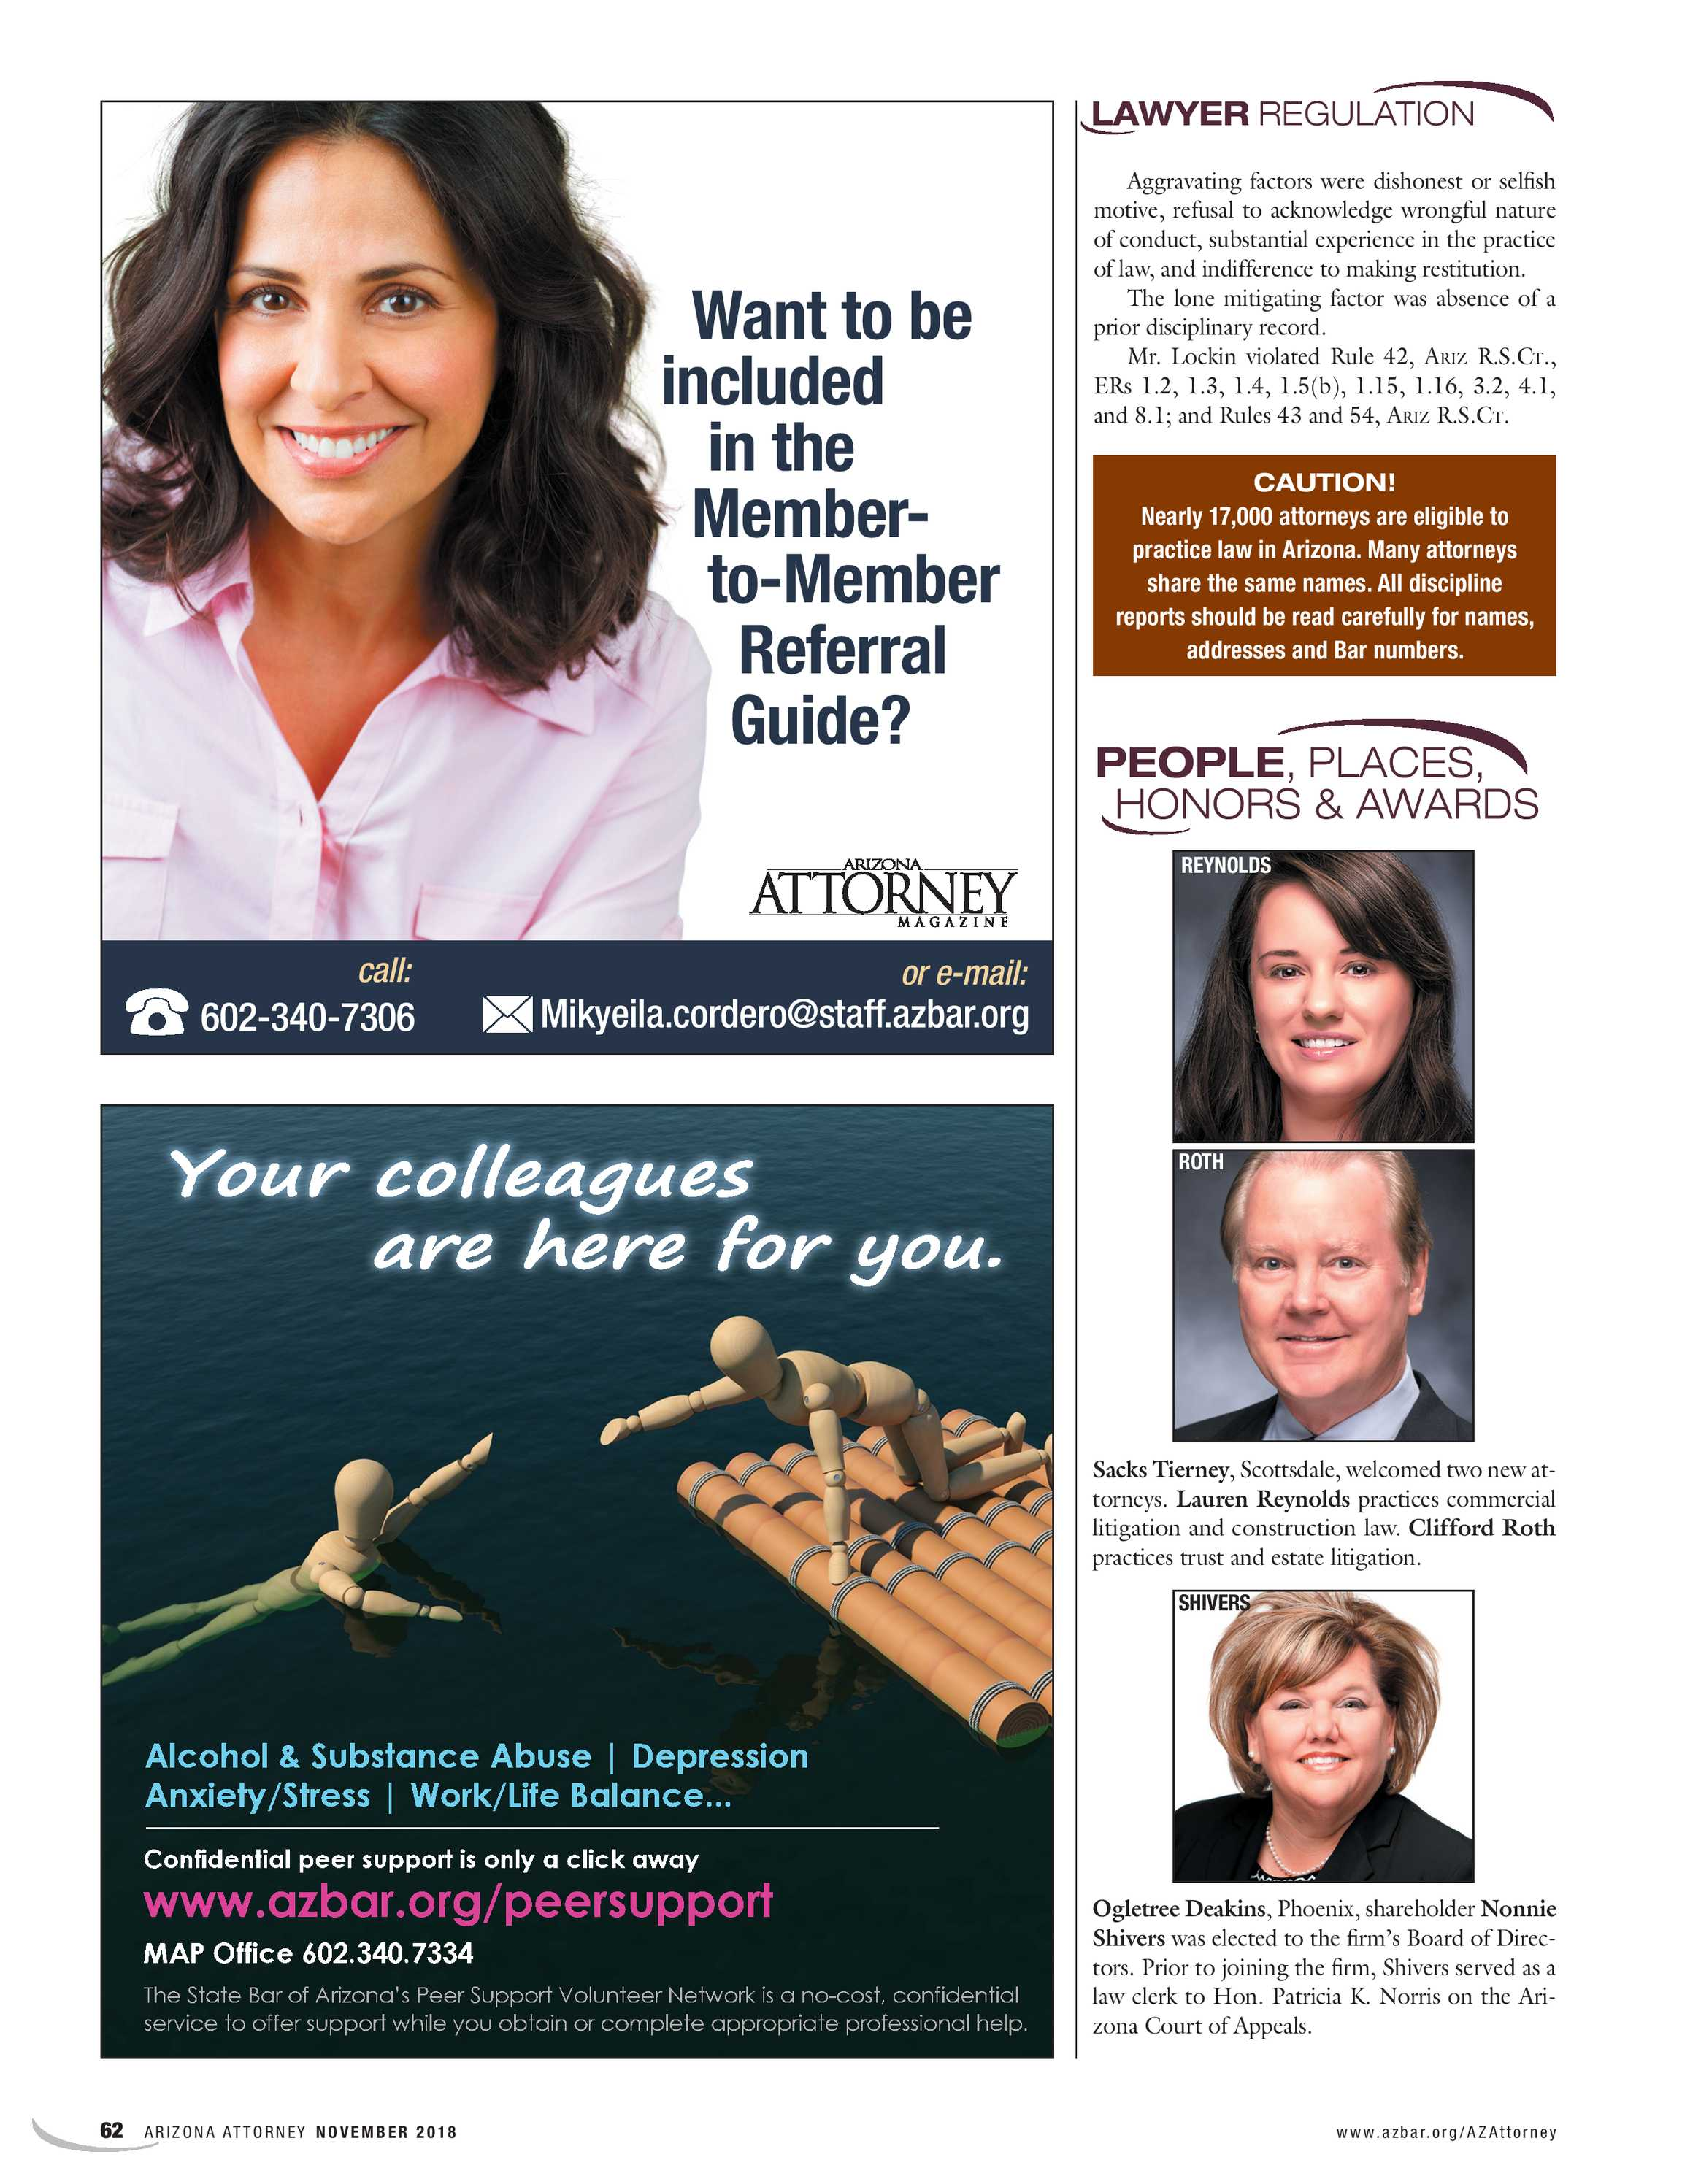 Arizona Attorney - November 2018 - page 62